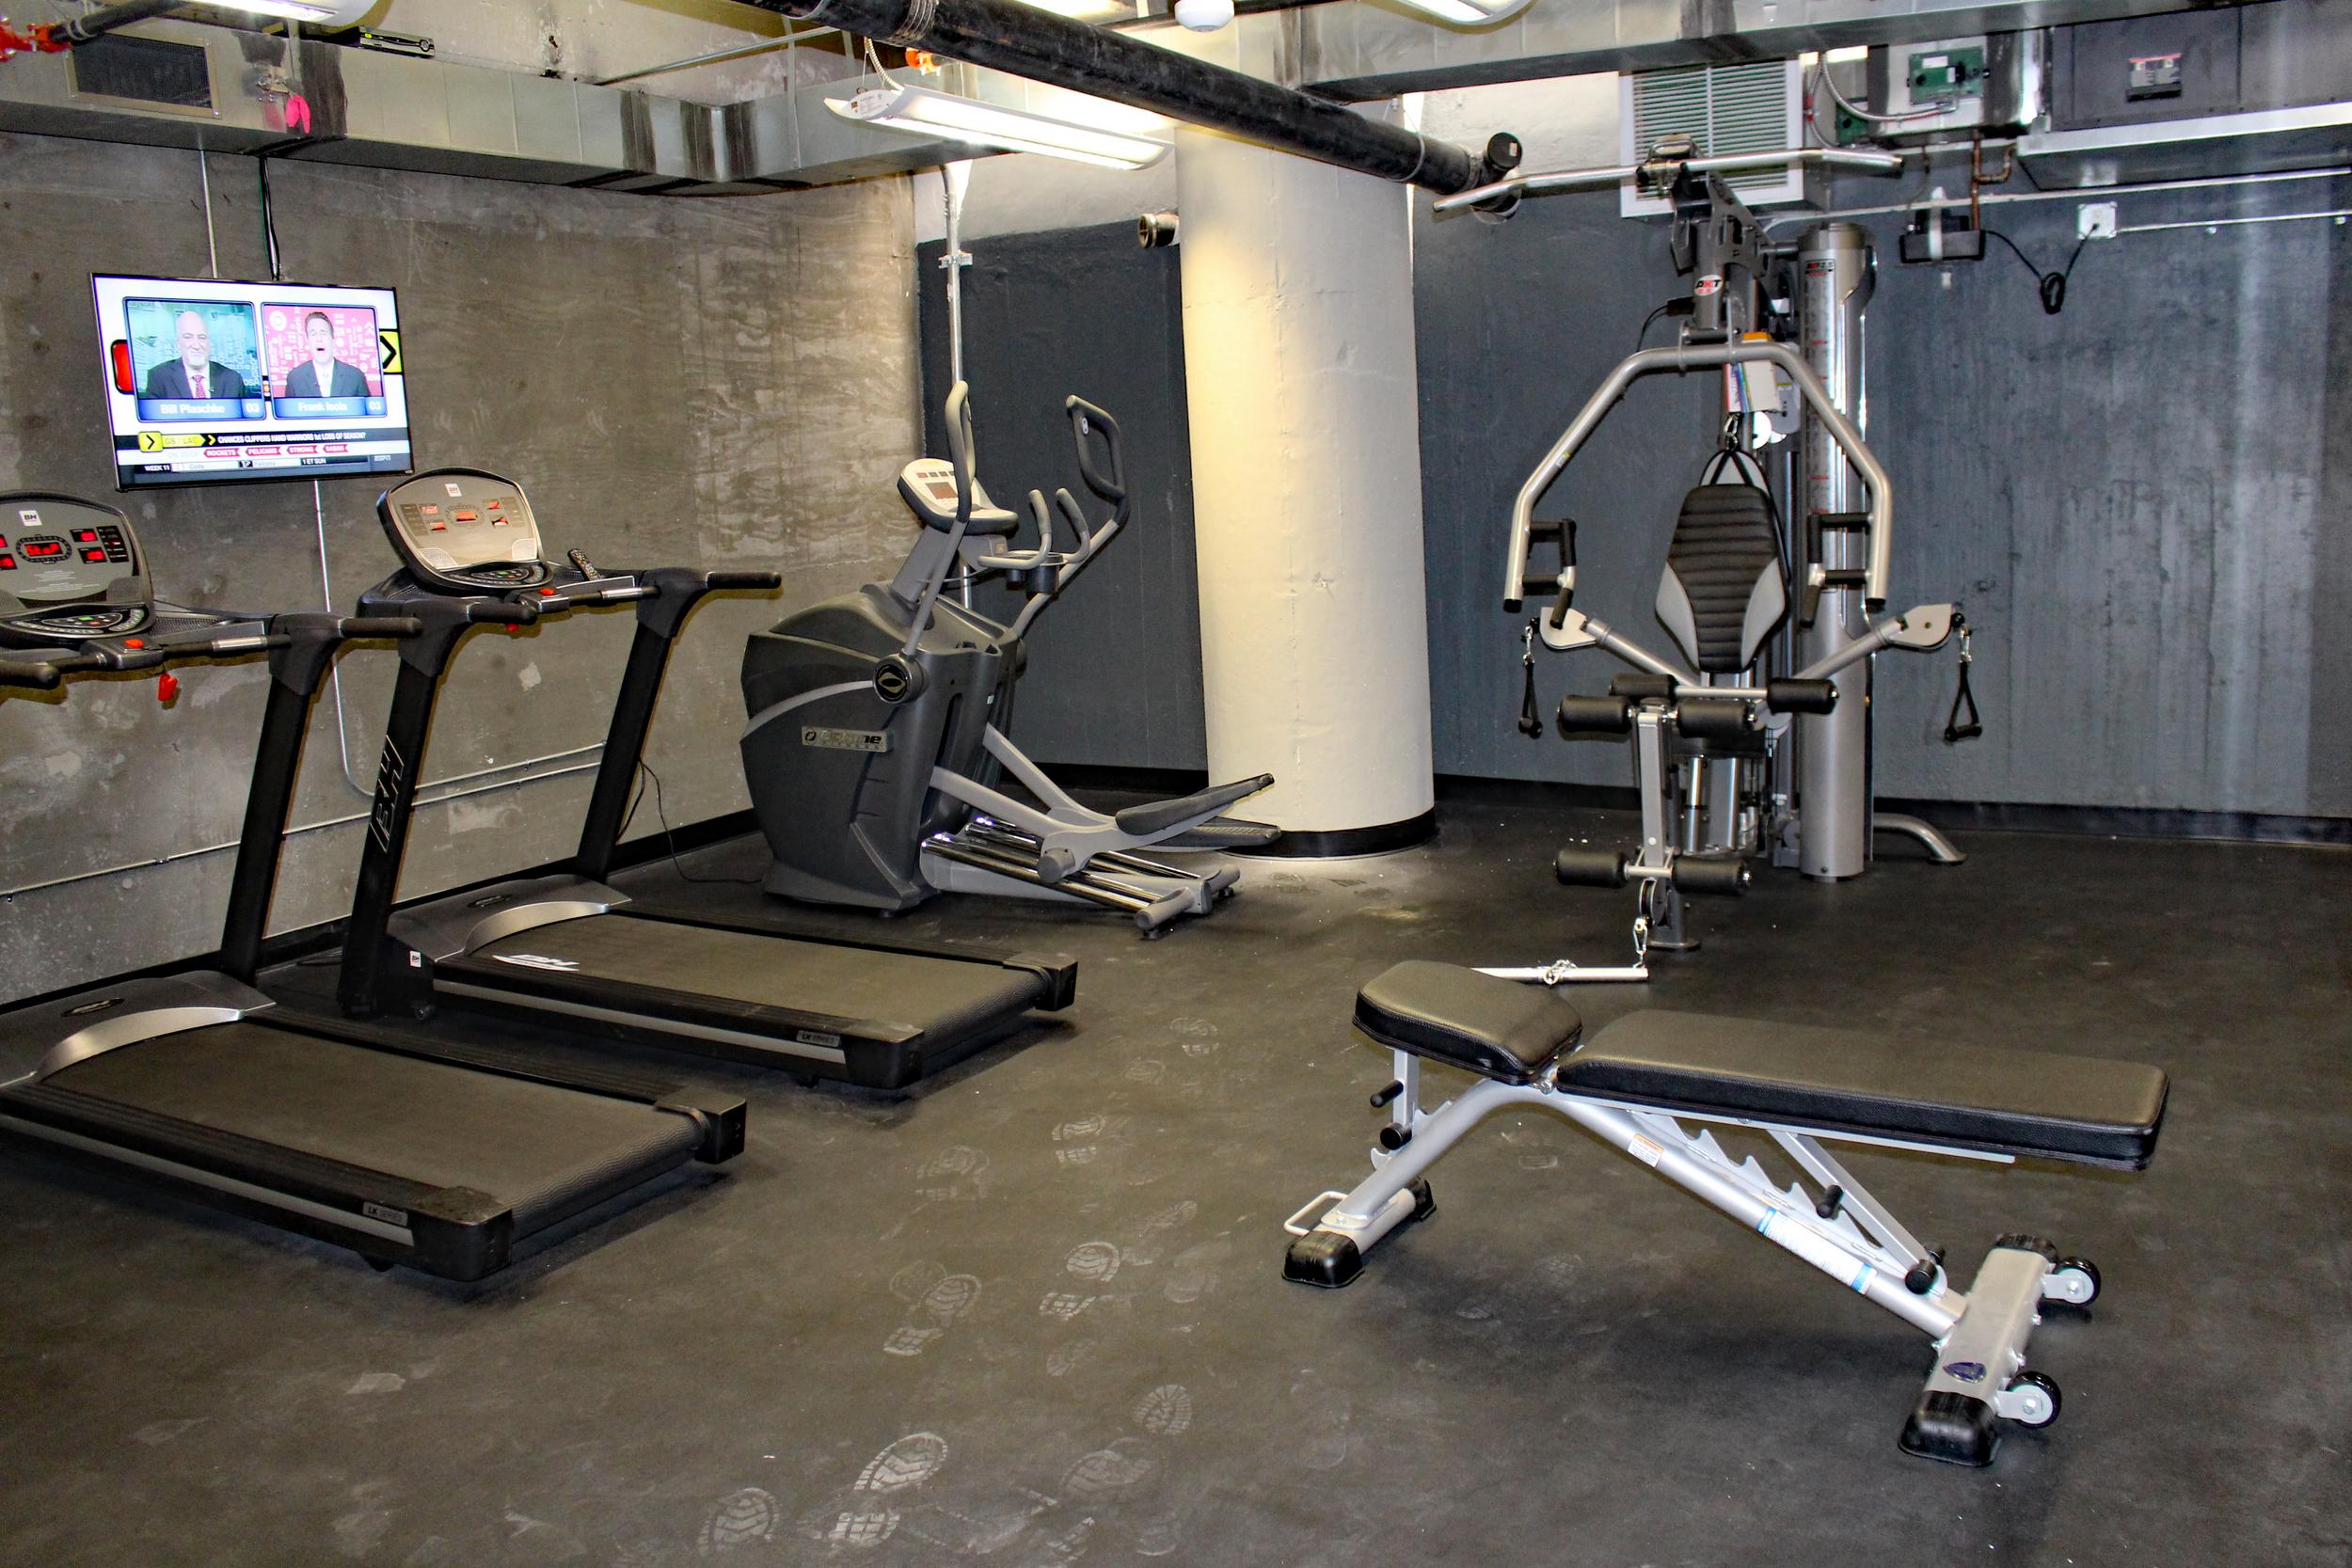 Garment Lofts Fitness Center